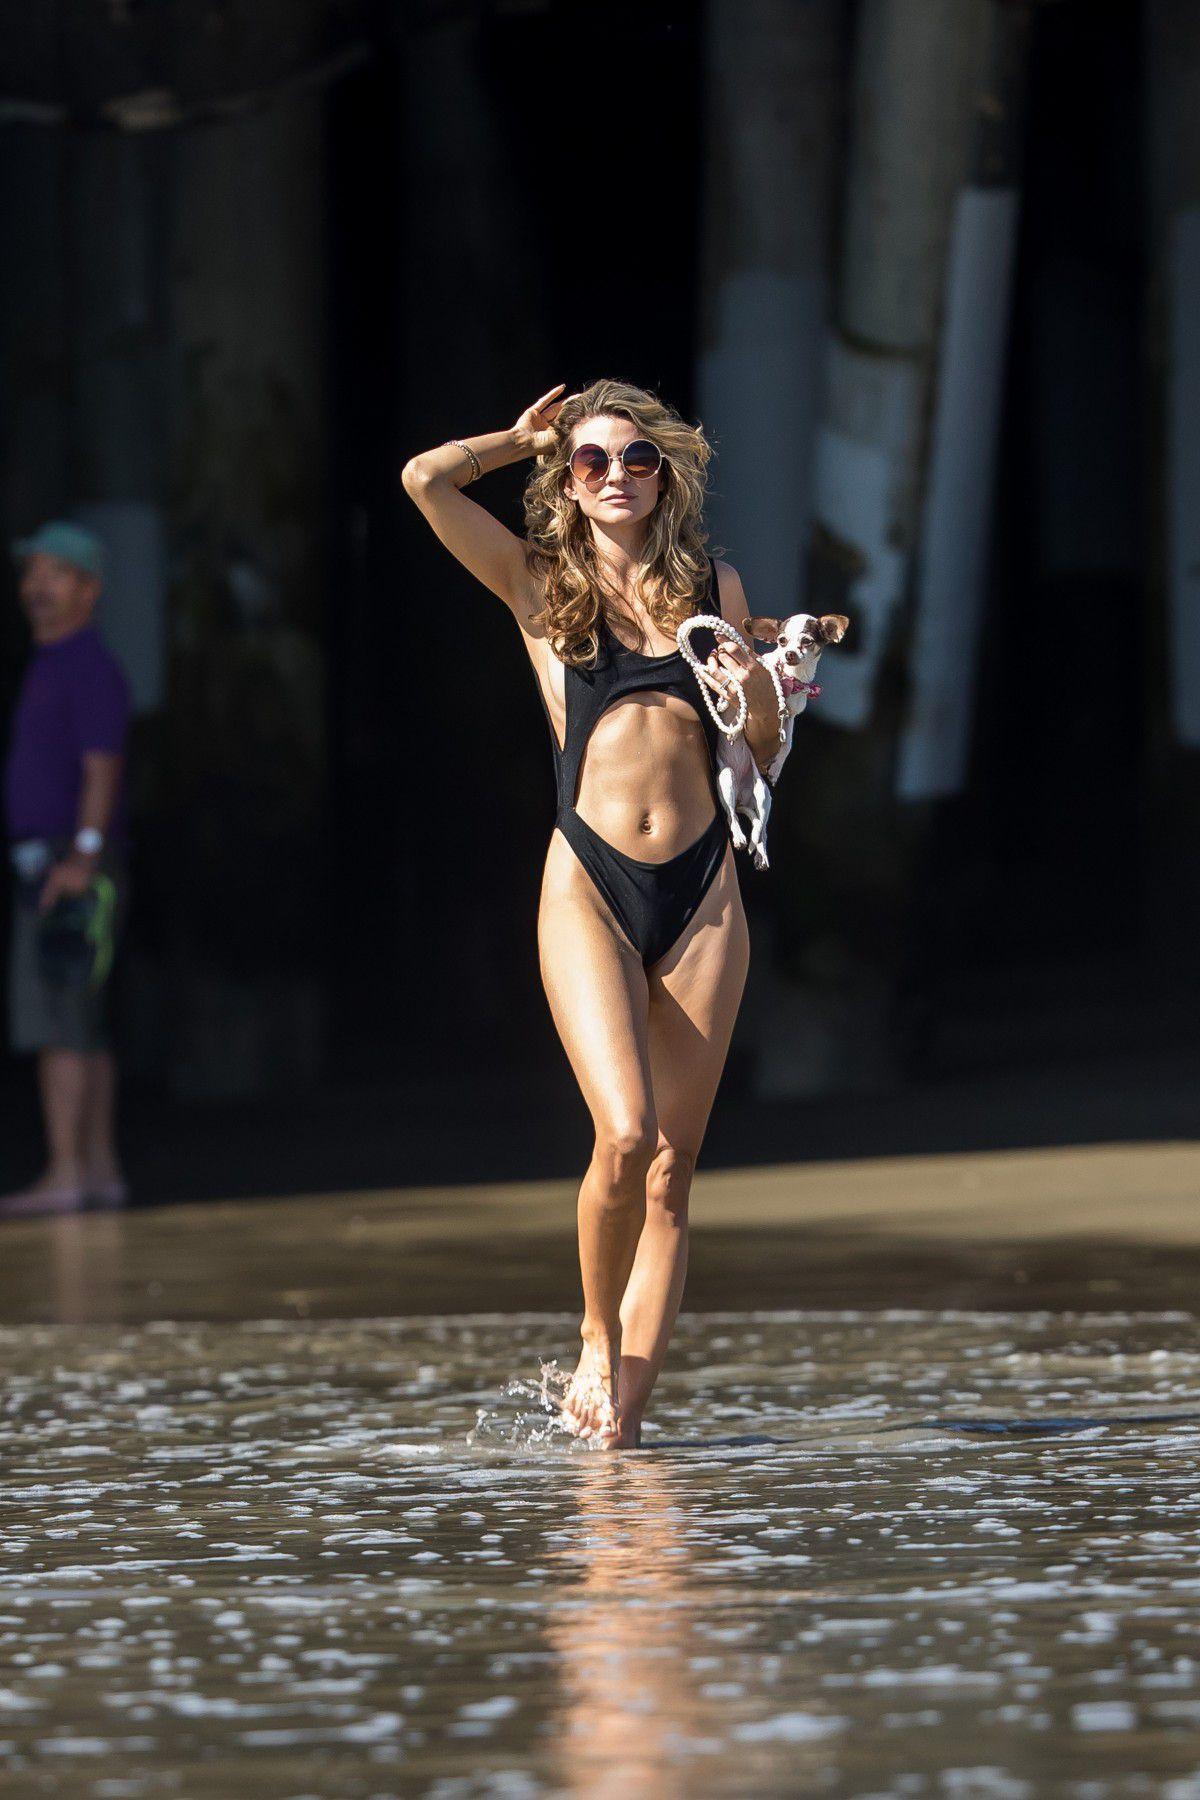 rachel-mccord-cameltoe-in-black-swimsuit-on-the-beach-in-santa-monica-9318